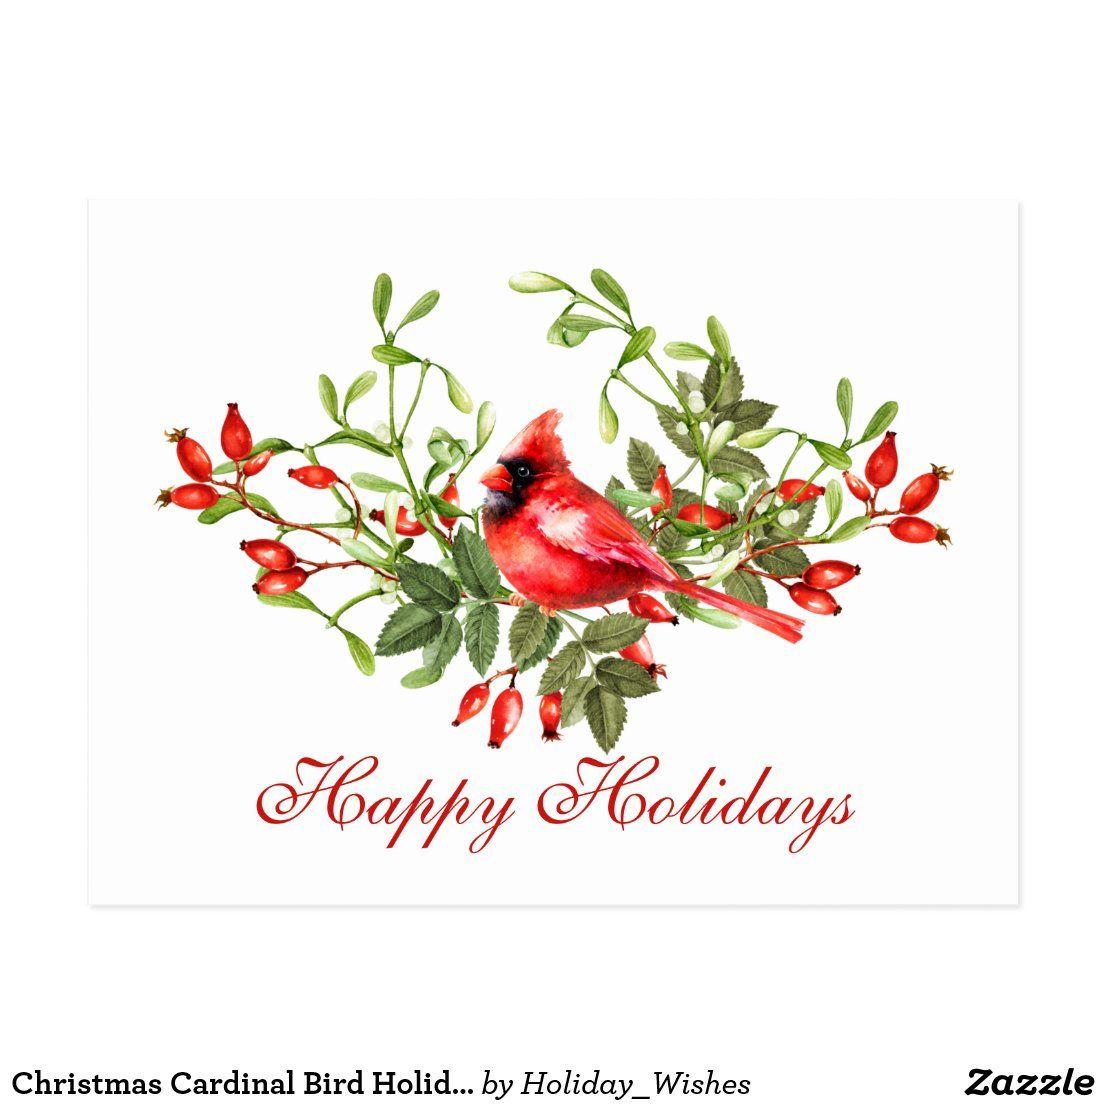 Christmas Cardinal Bird Holiday Corporate Greeting Postcard #zazzle #zazzlemade #christmas #newyear #customparty #partysupplies #custominvitation #invitations #holidaycards #customdecor #holidays #printondemand #customstationery #invitationtemplate #partyinvitation #partydecor #partydecorations #customgifts